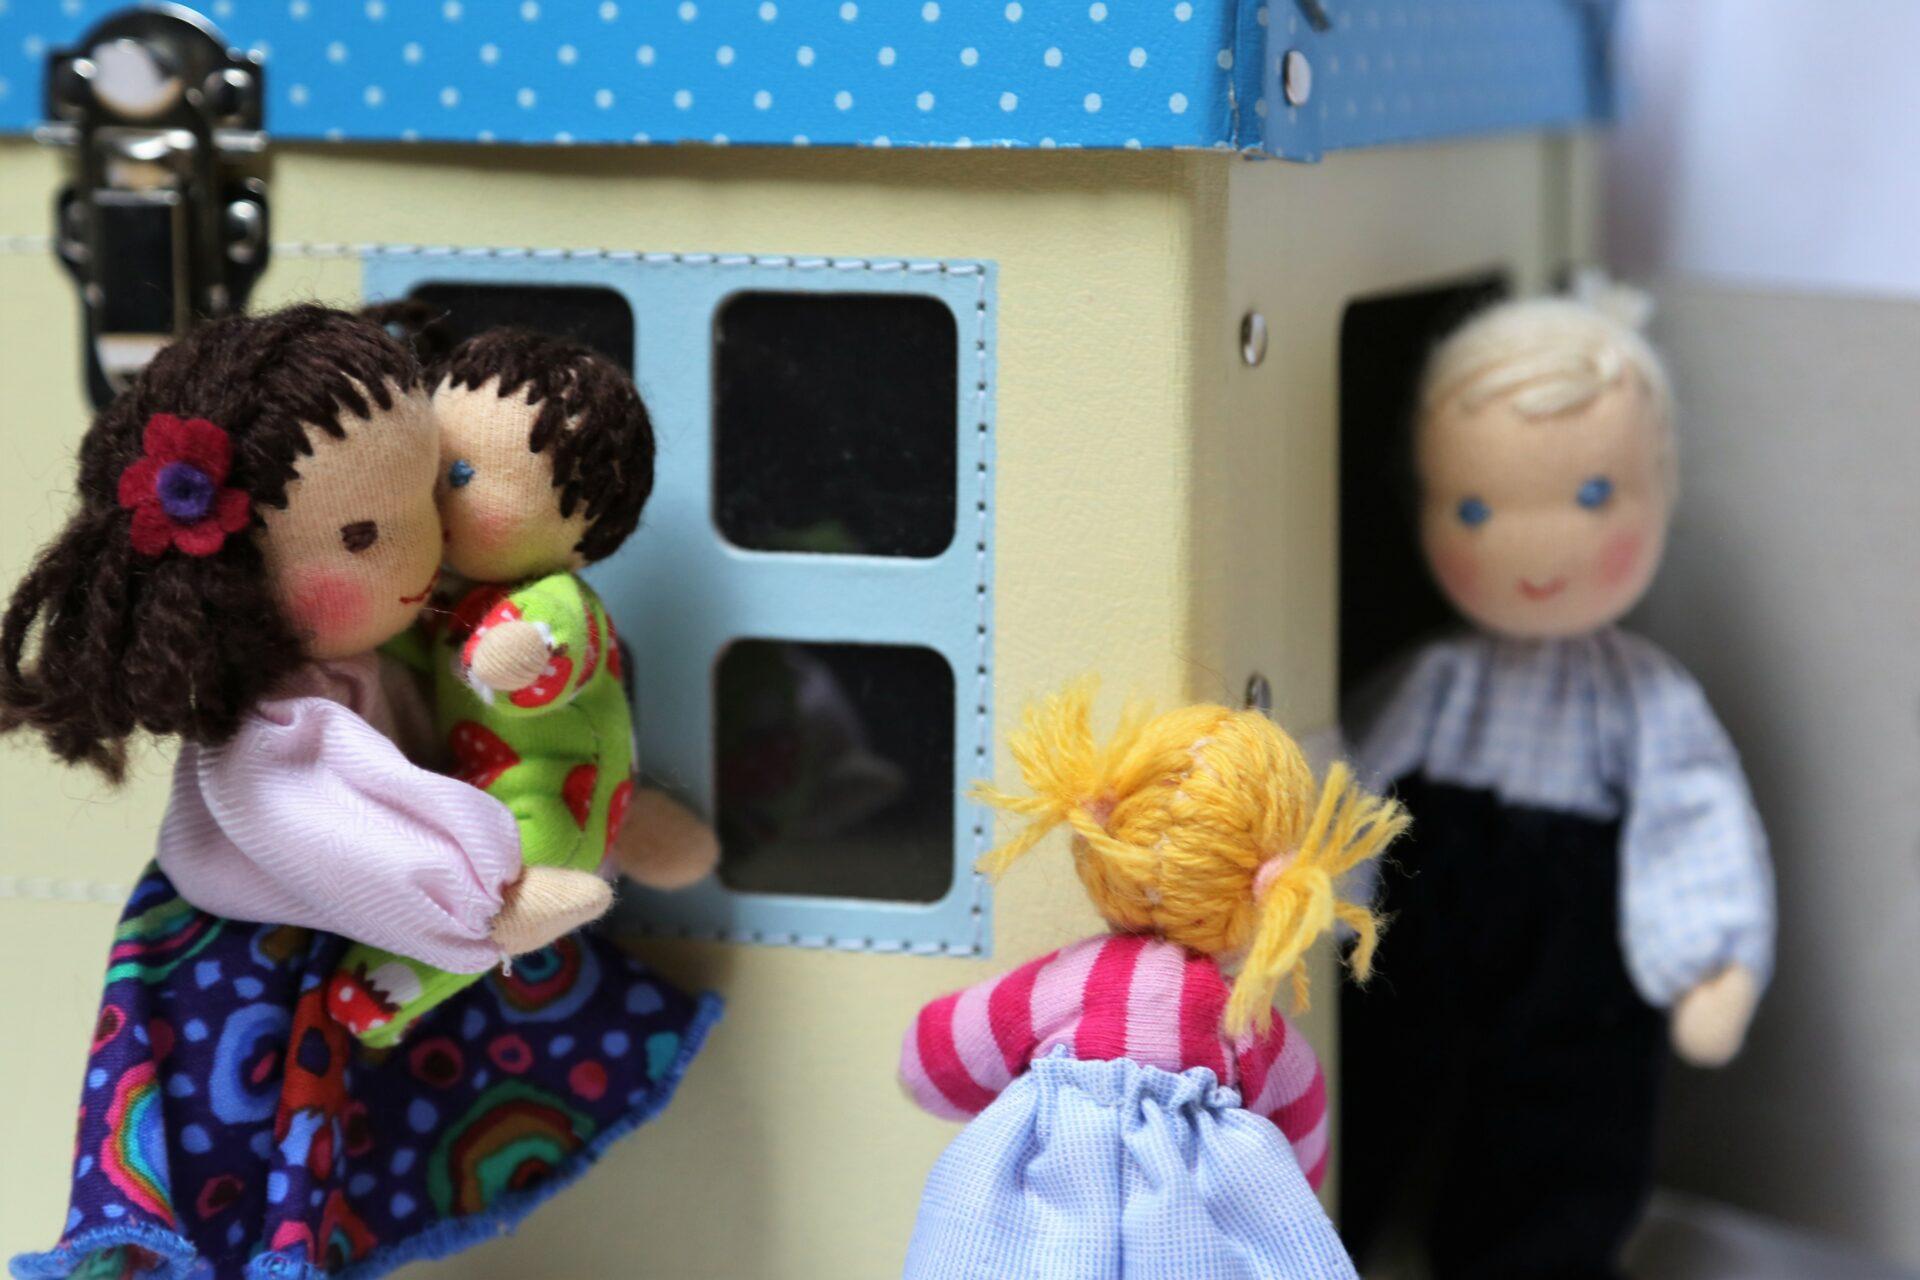 Ekopanenky do domečku, panenky do domečku, waldorfské panenky, panenky s duší